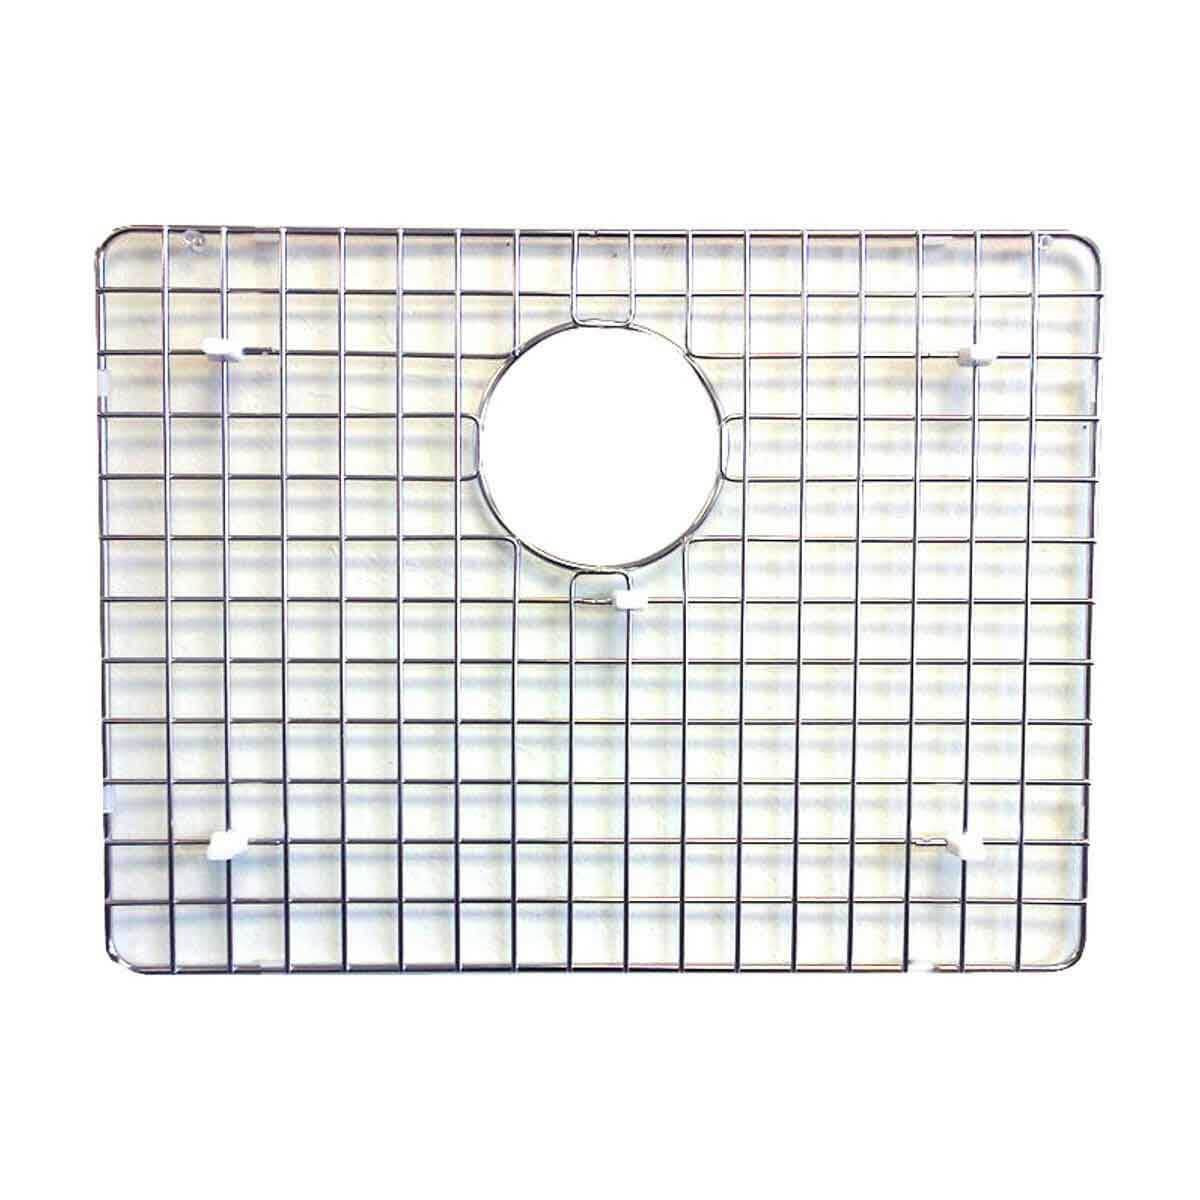 Artisan Chef Pro Grids BG-1515S